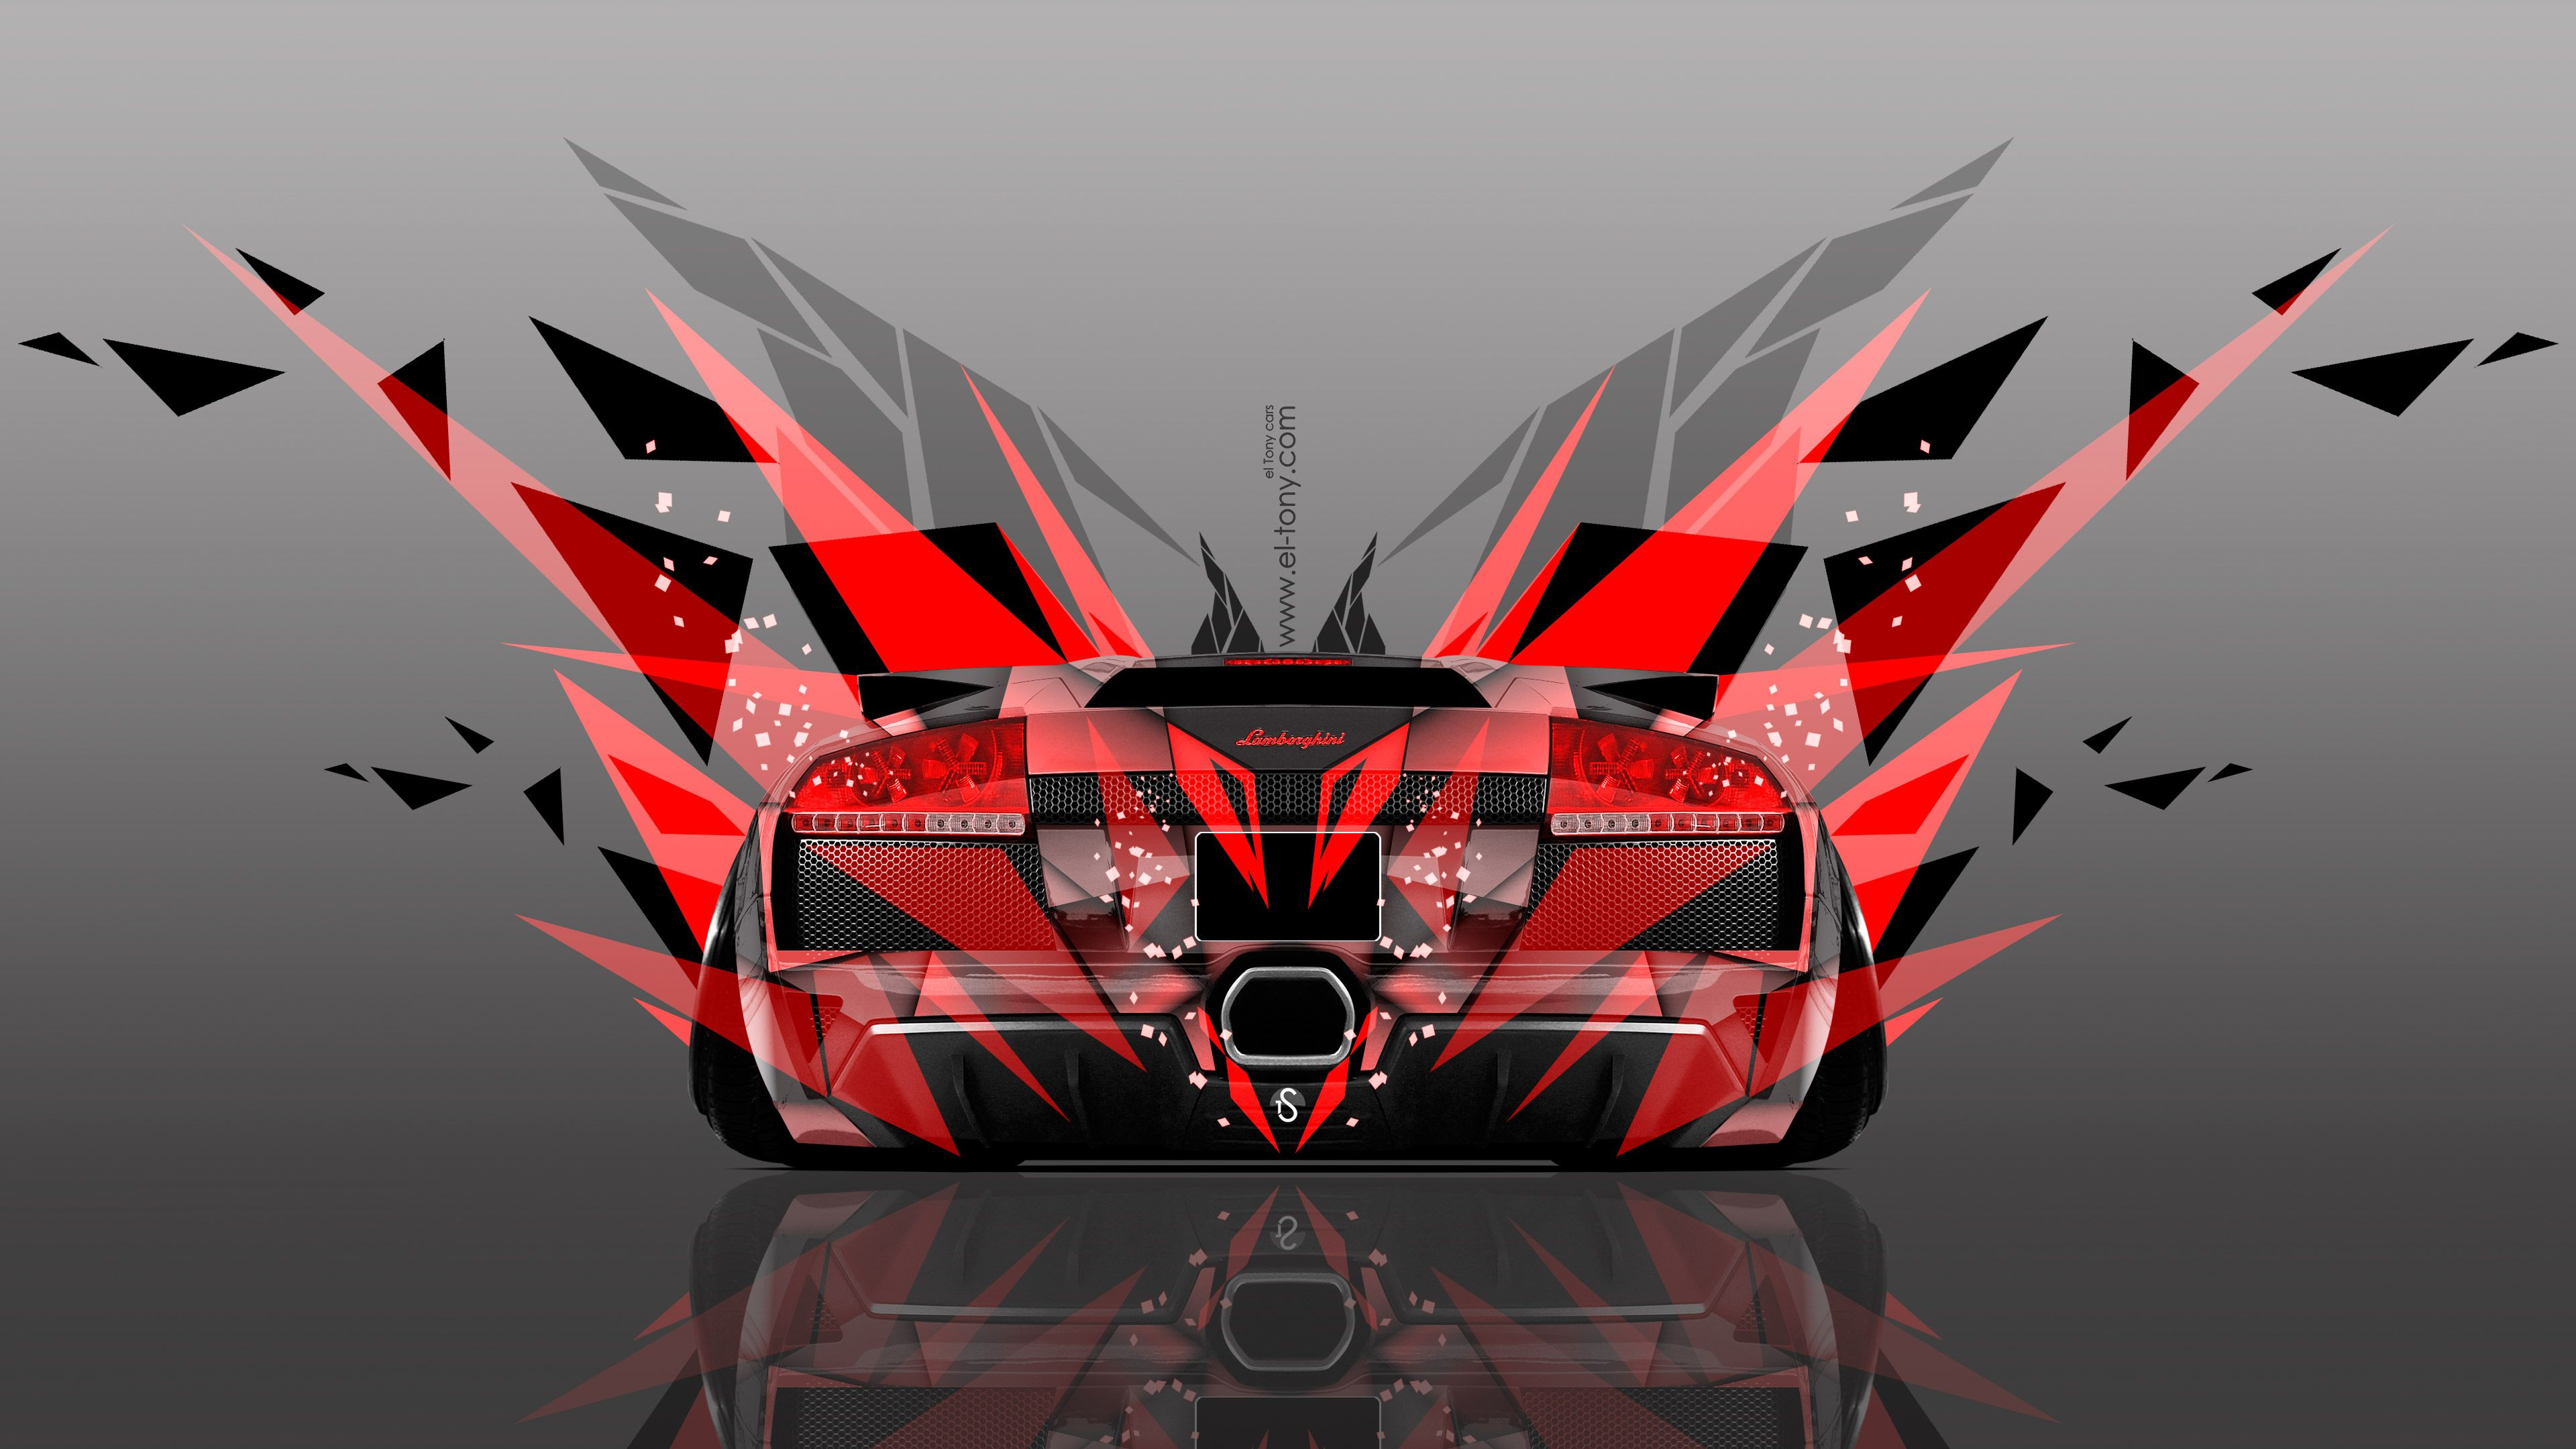 Wonderful Lamborghini Gallardo Back Abstract Car Design By Tony Kokhan Wallpapers) U2013  HD Desktop Wallpapers